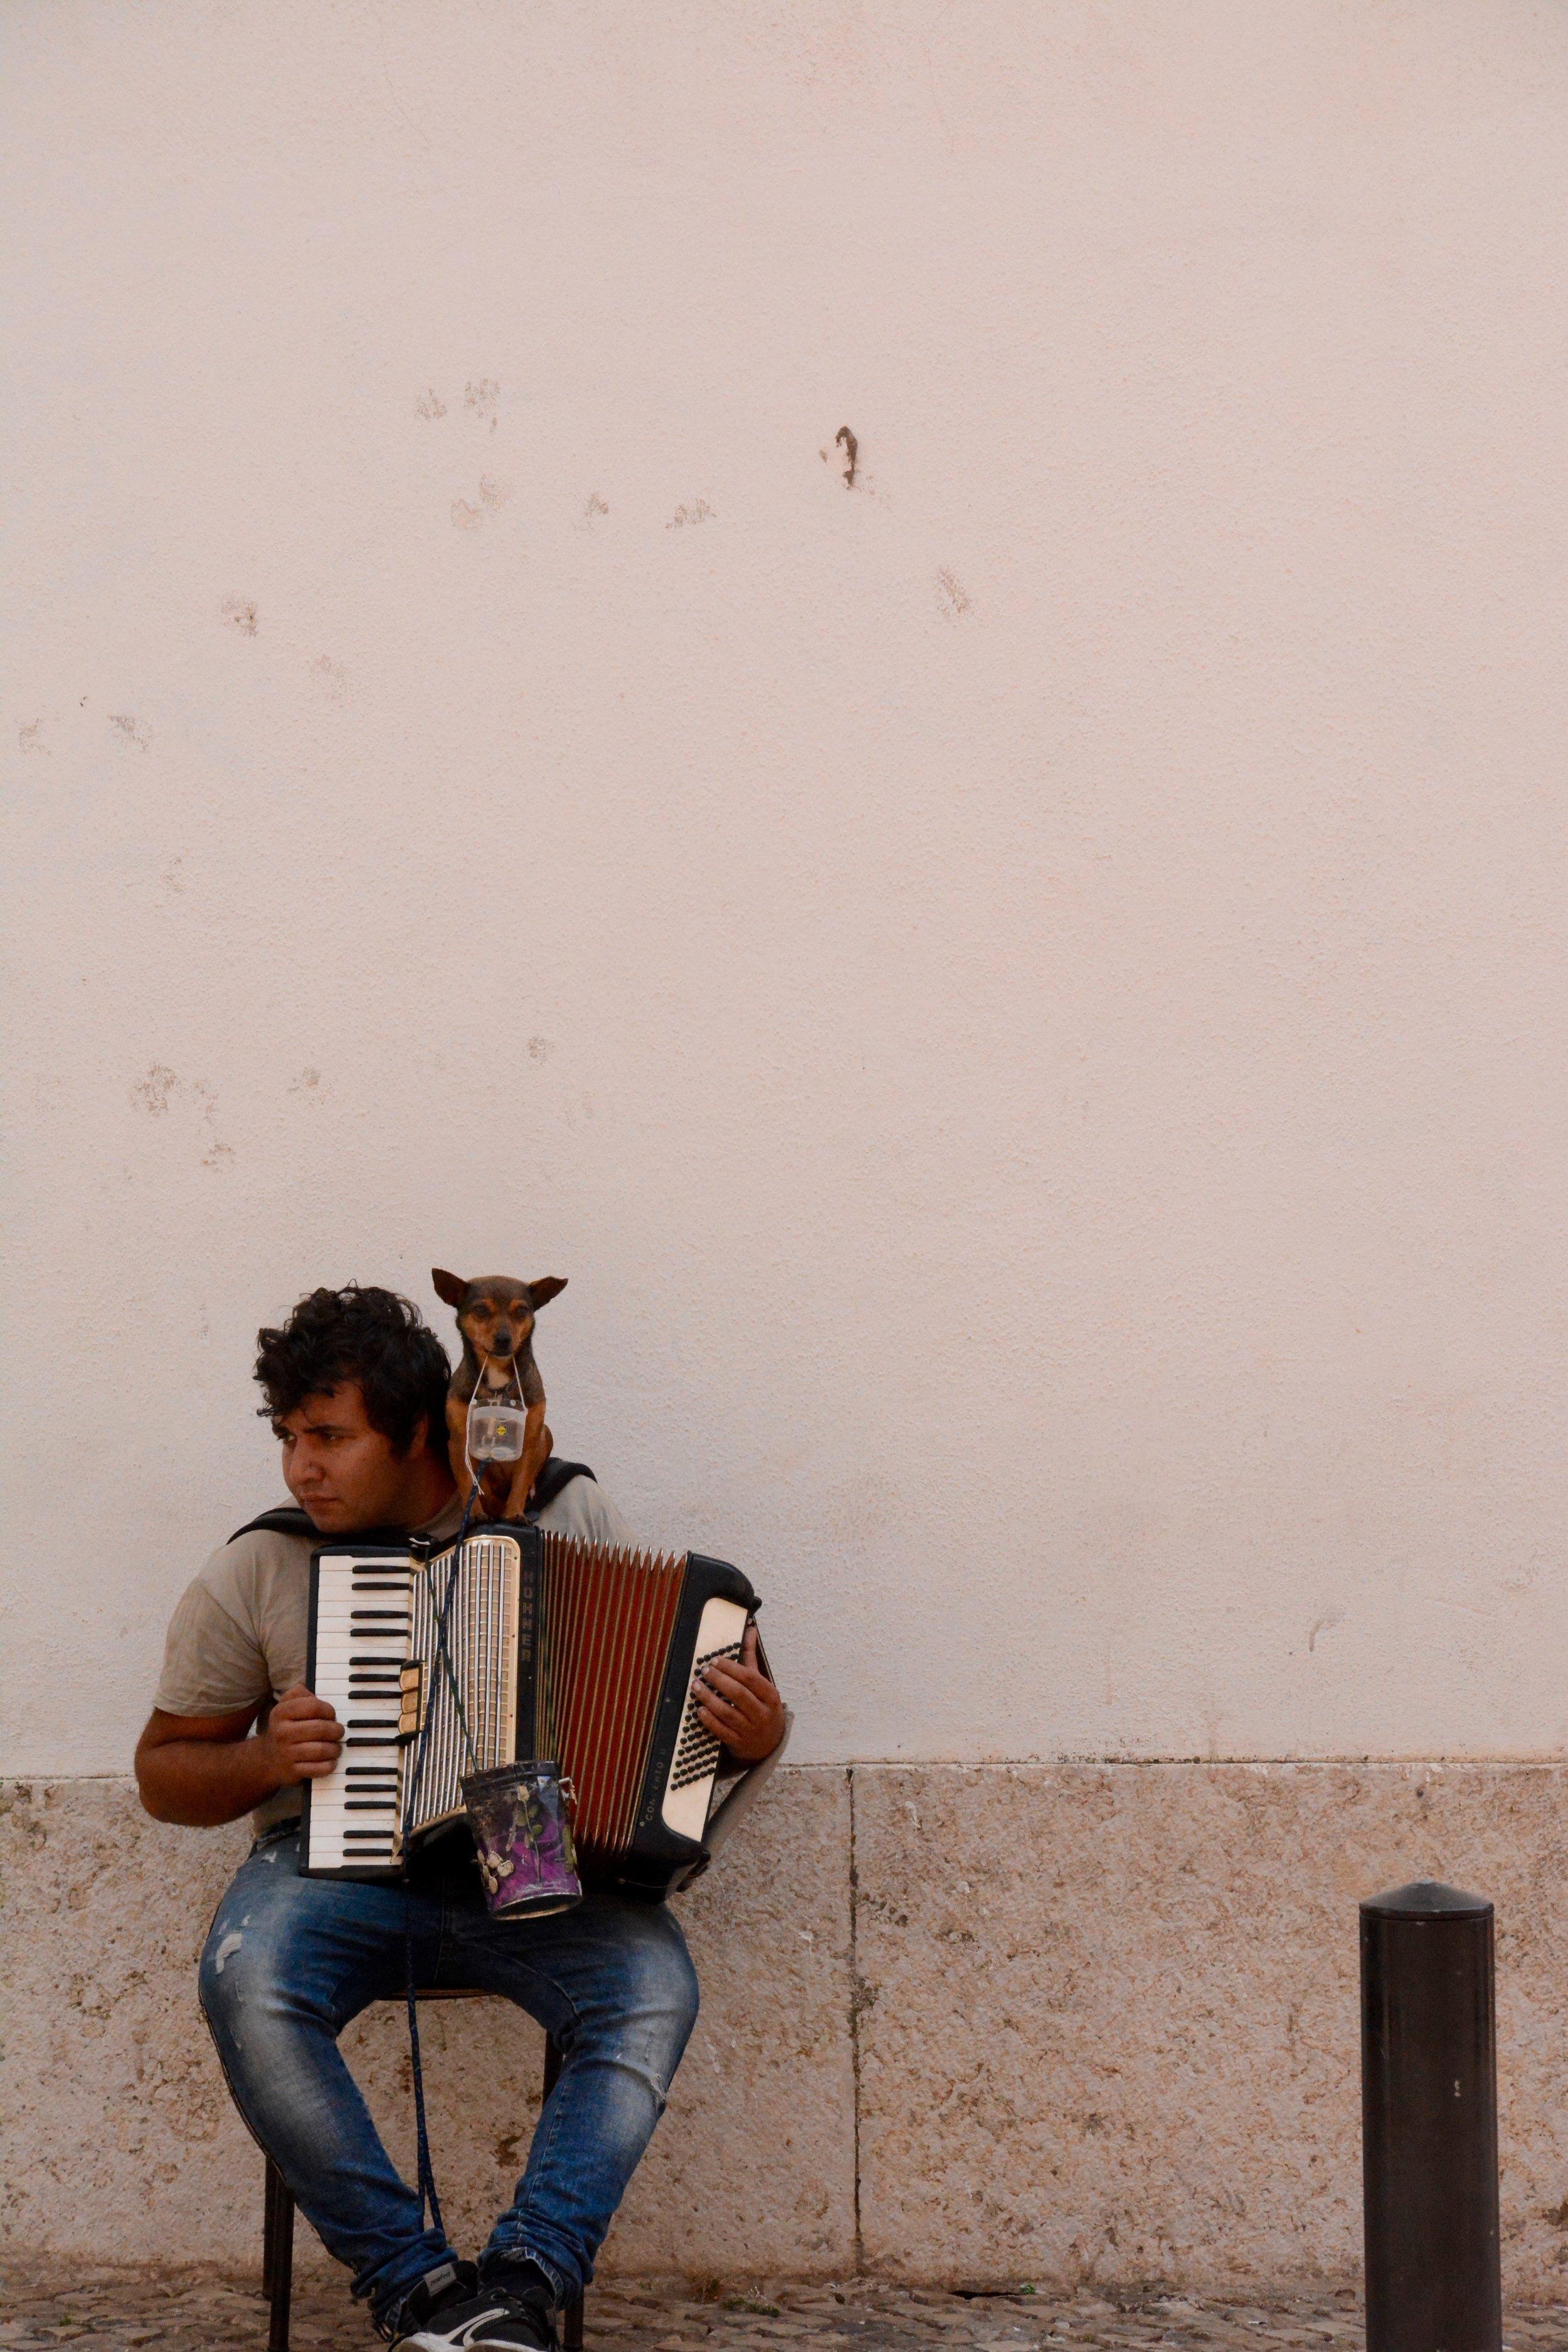 musician with dog.jpg